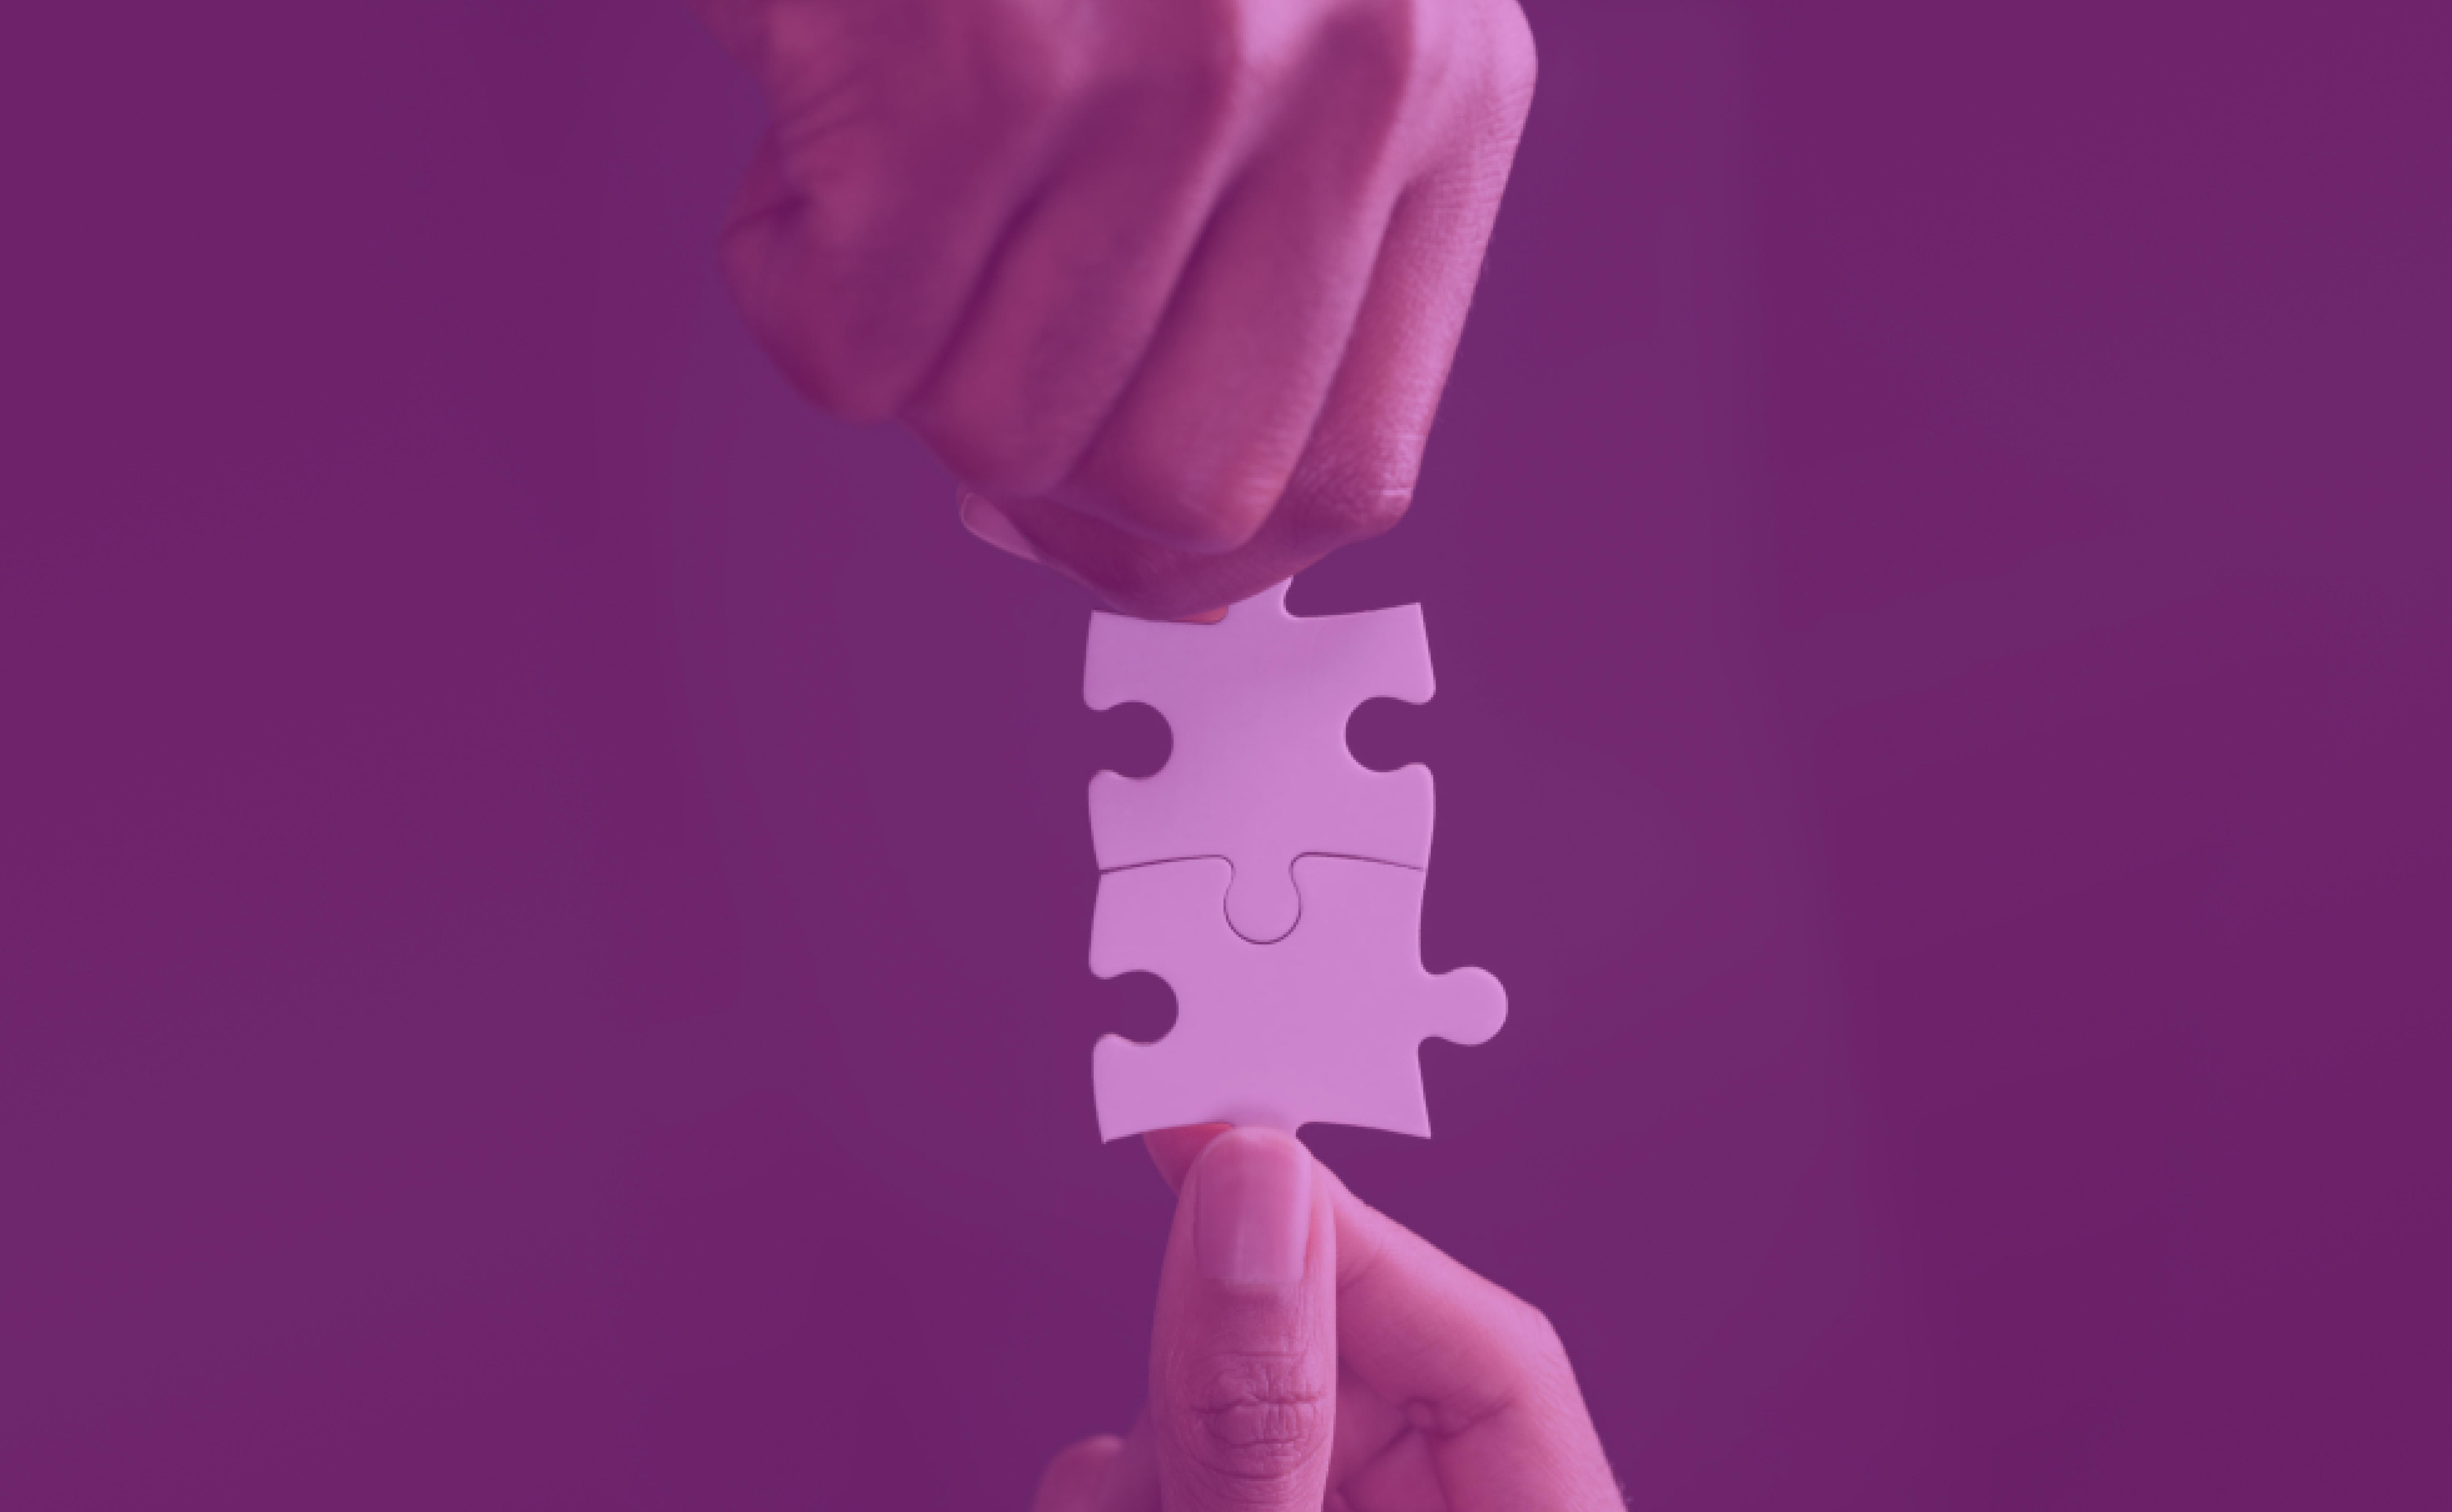 Interactio joins Cloud Security Alliance (CSA)